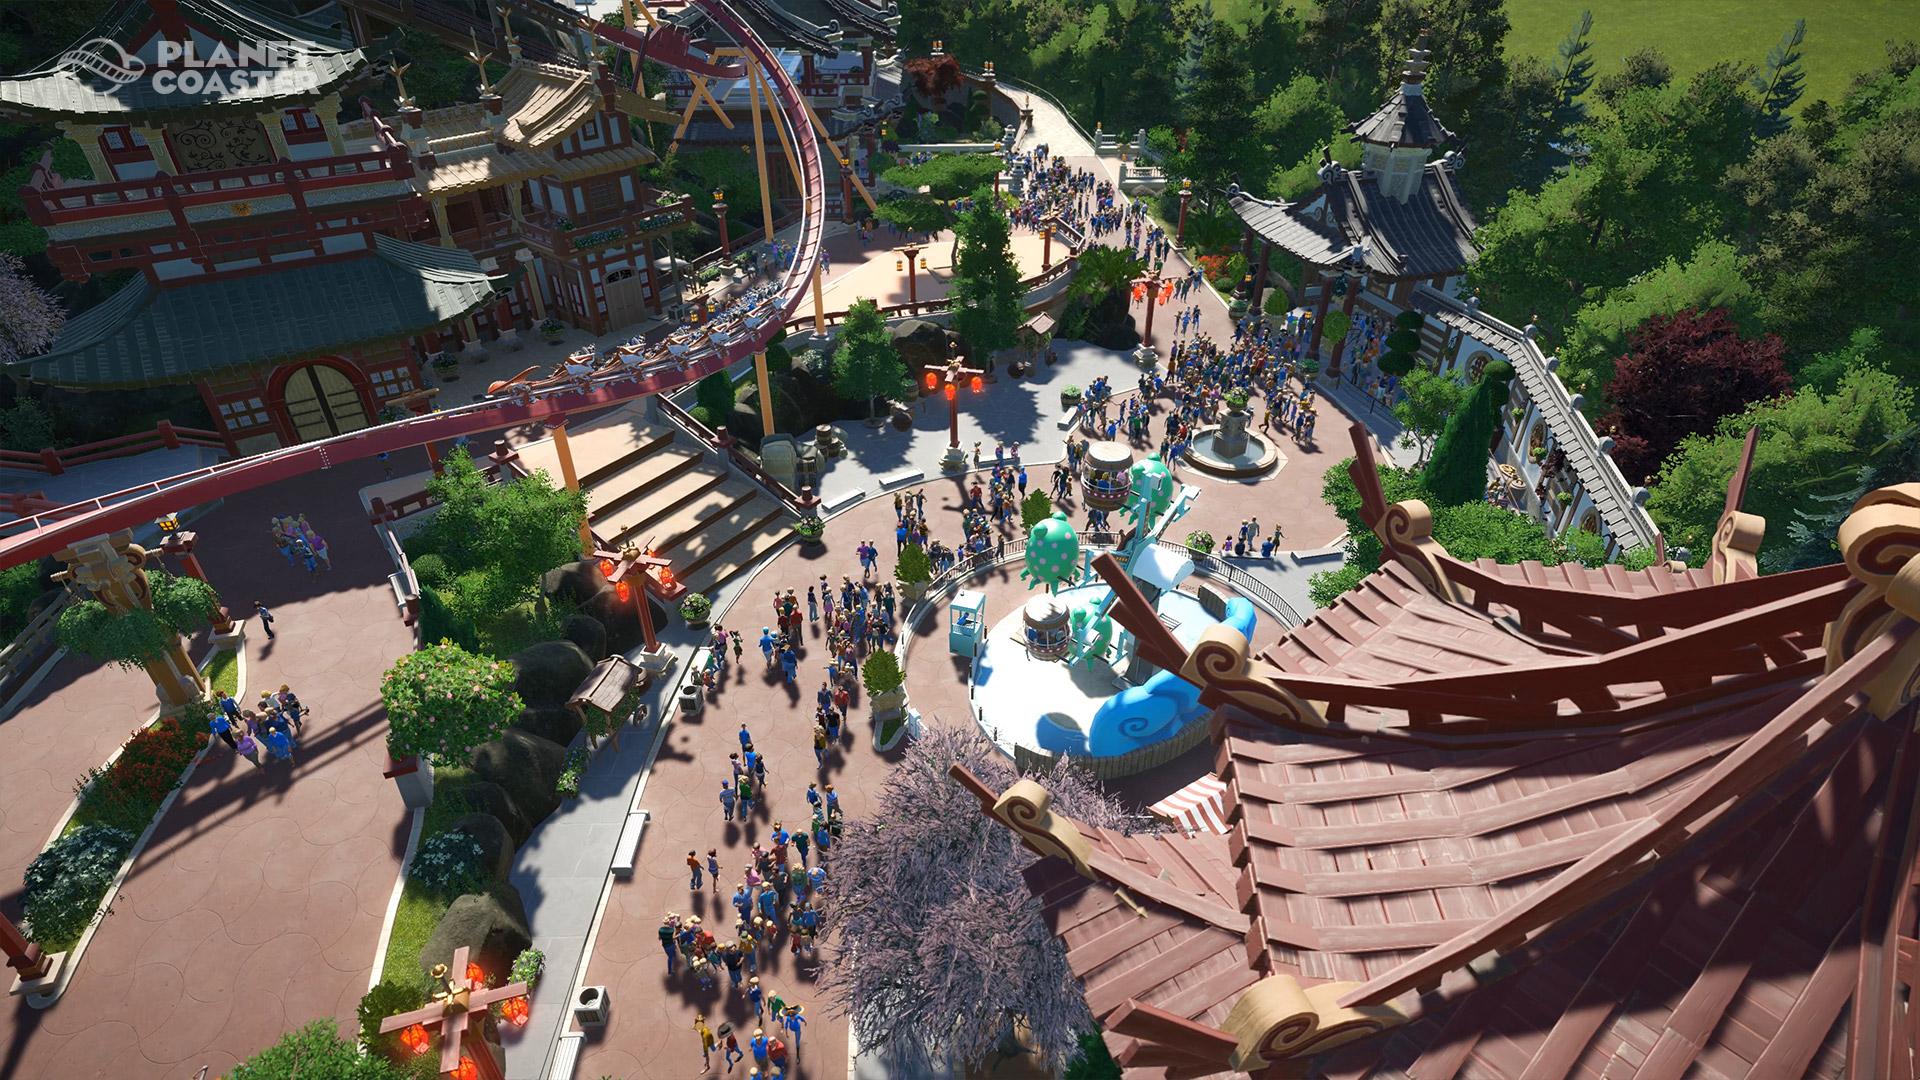 Planet Coaster Asiatischer Park